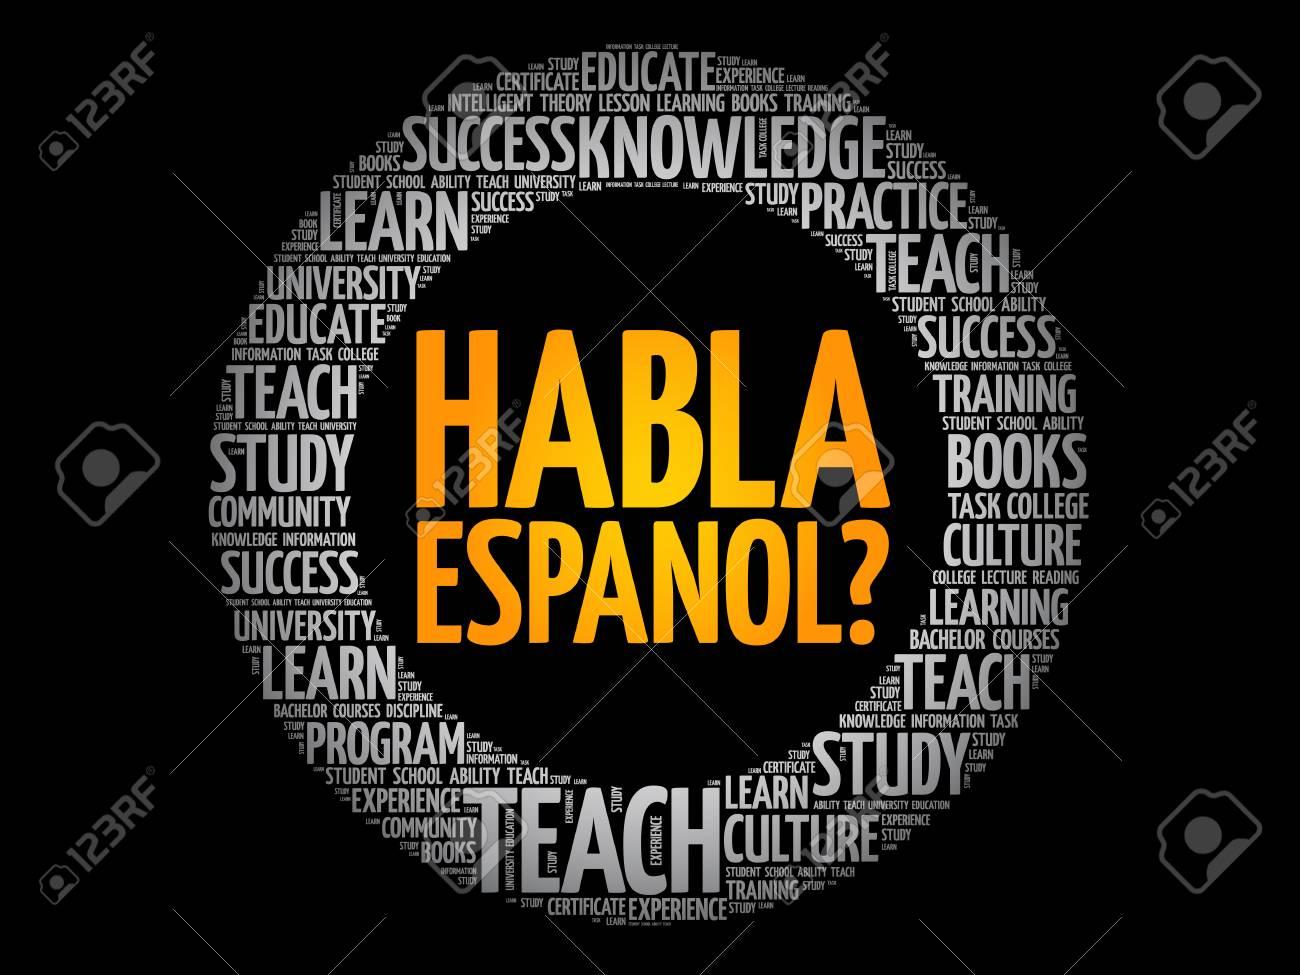 Habla Espanol? (Speak Spanish?) word cloud, education business concept - 123436971